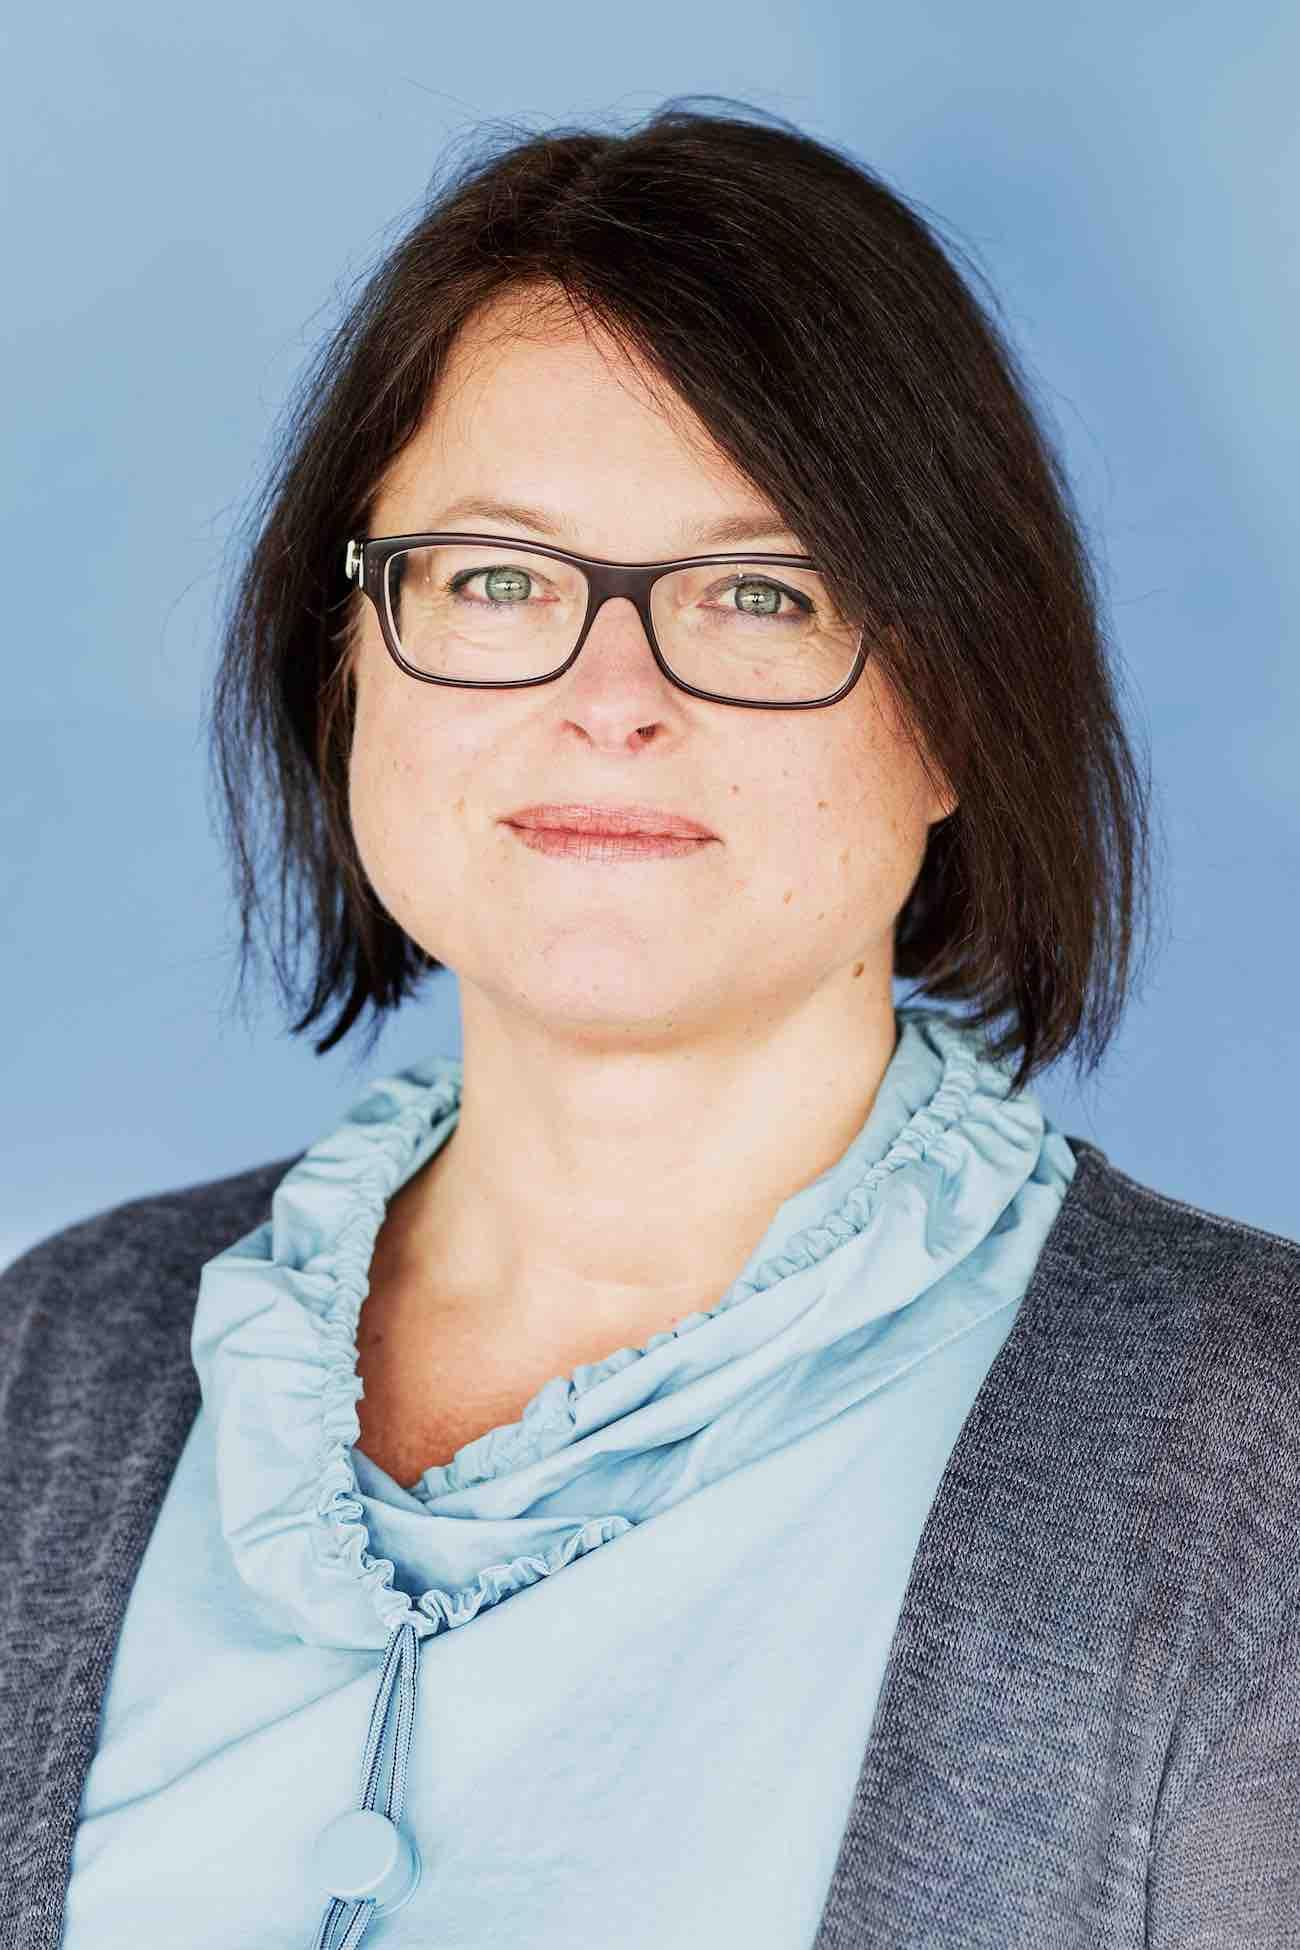 Sigrid Neudecker